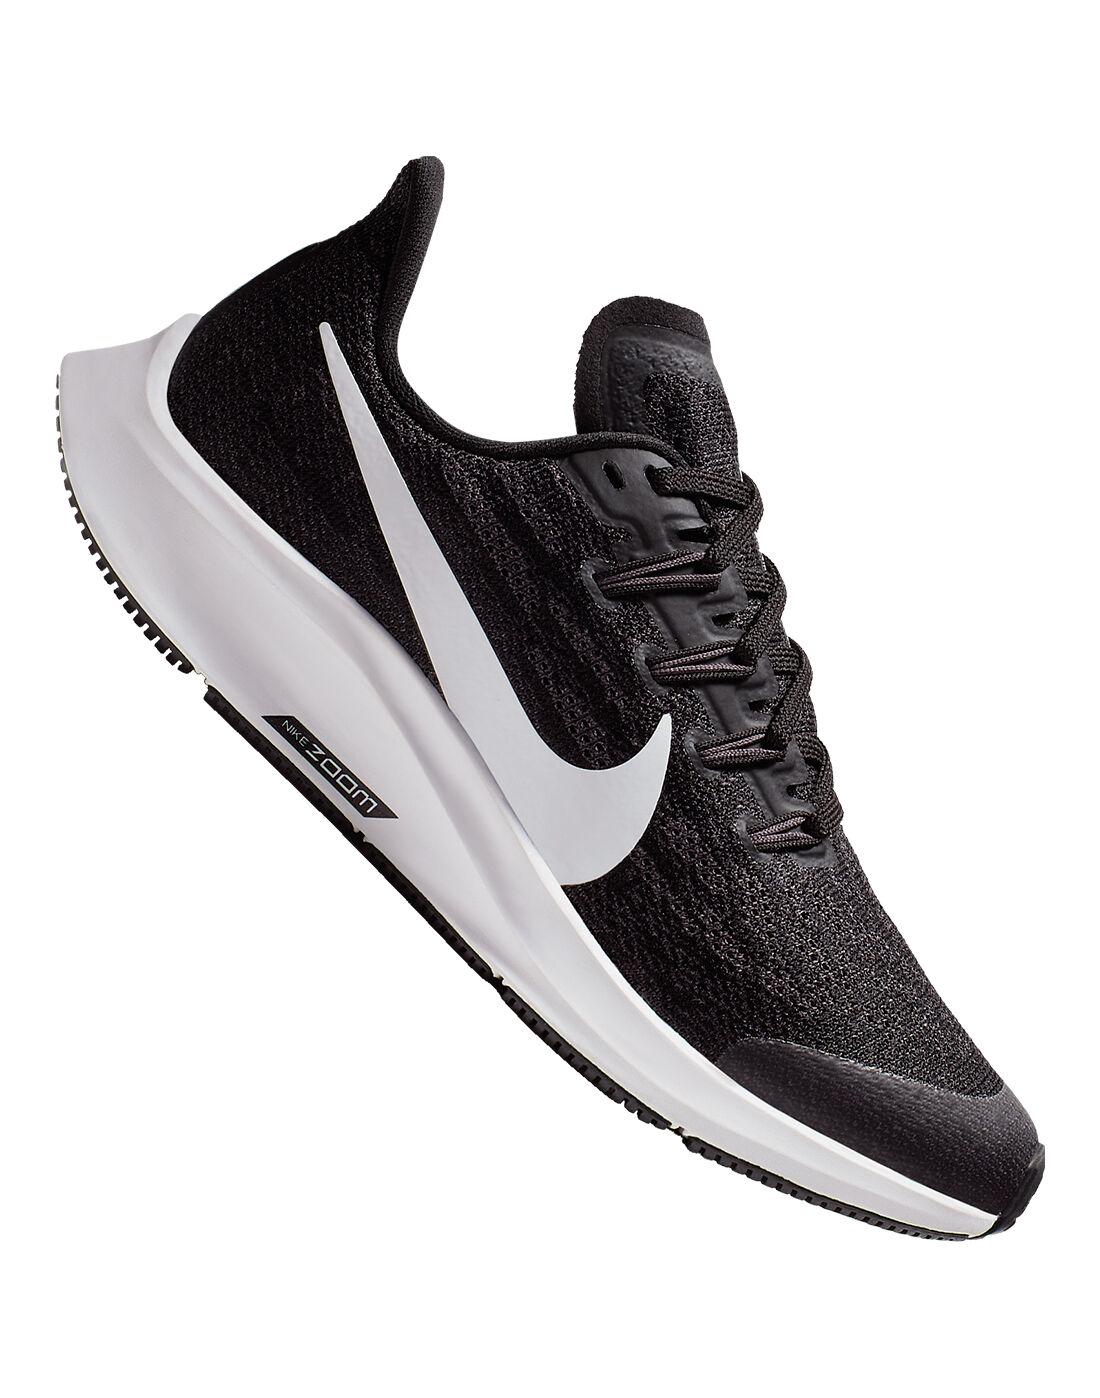 All Boys Footwear | Life Style Sports